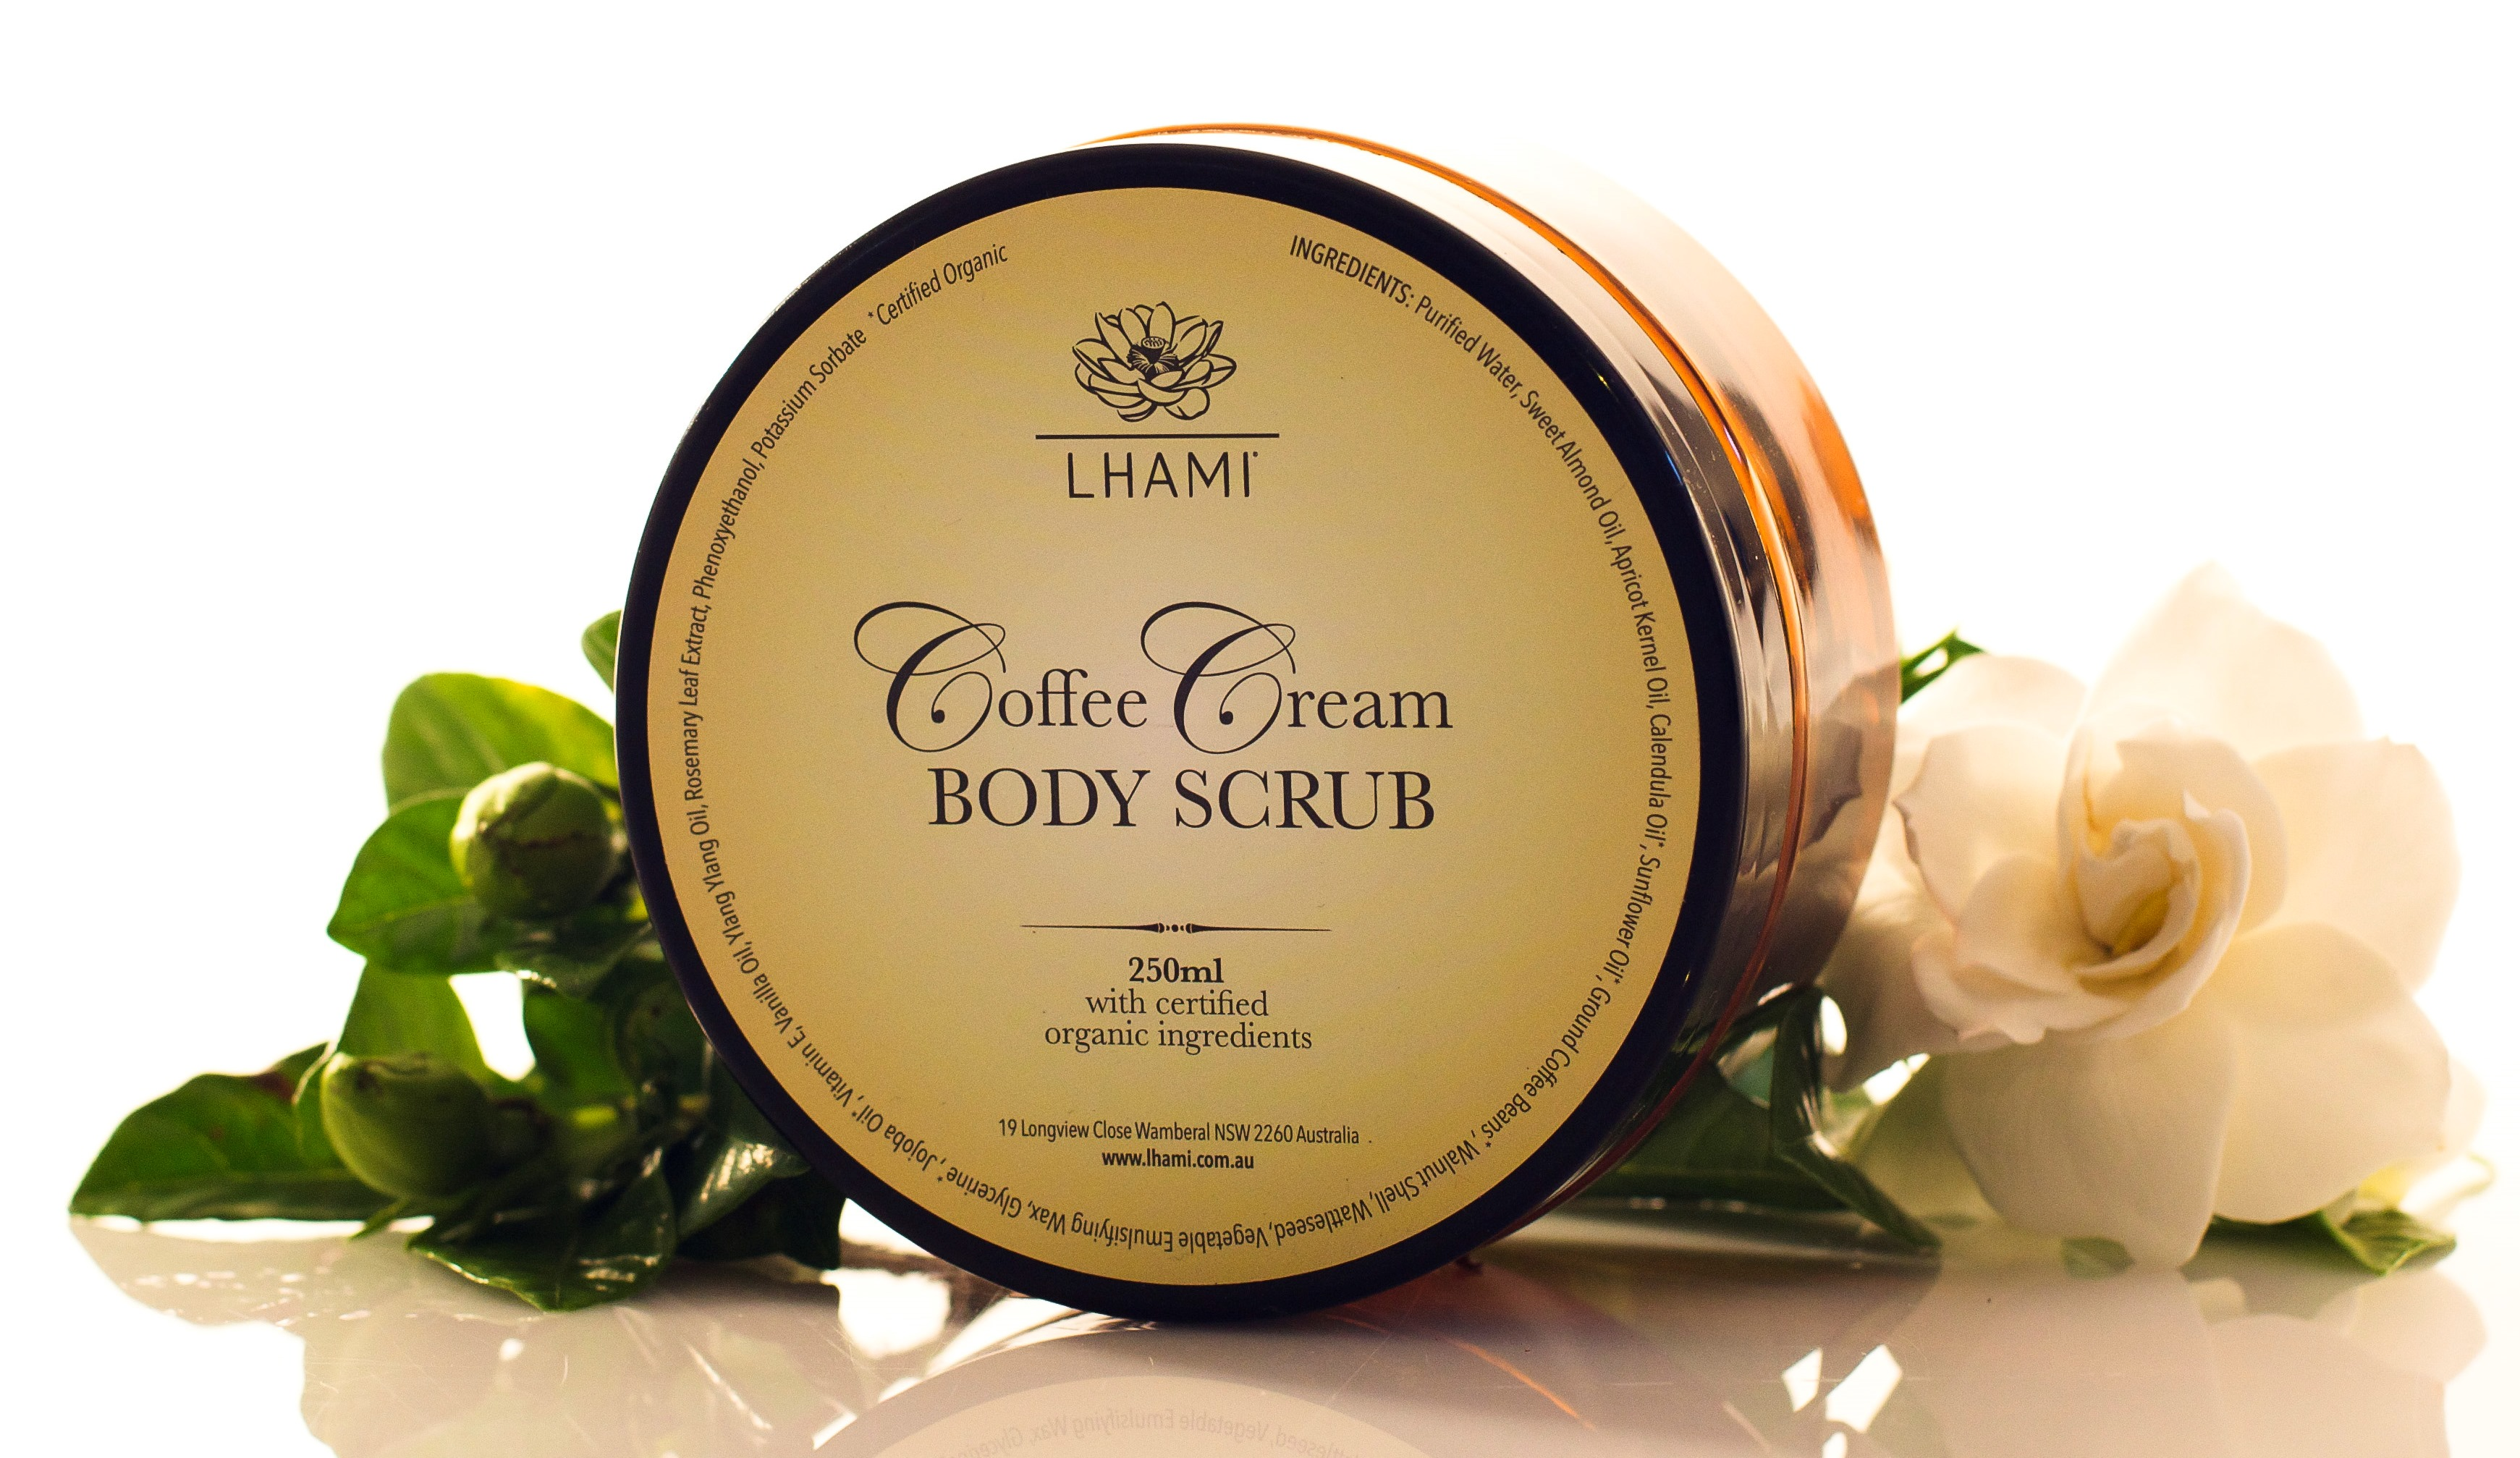 Coffee Cream Body Scrub